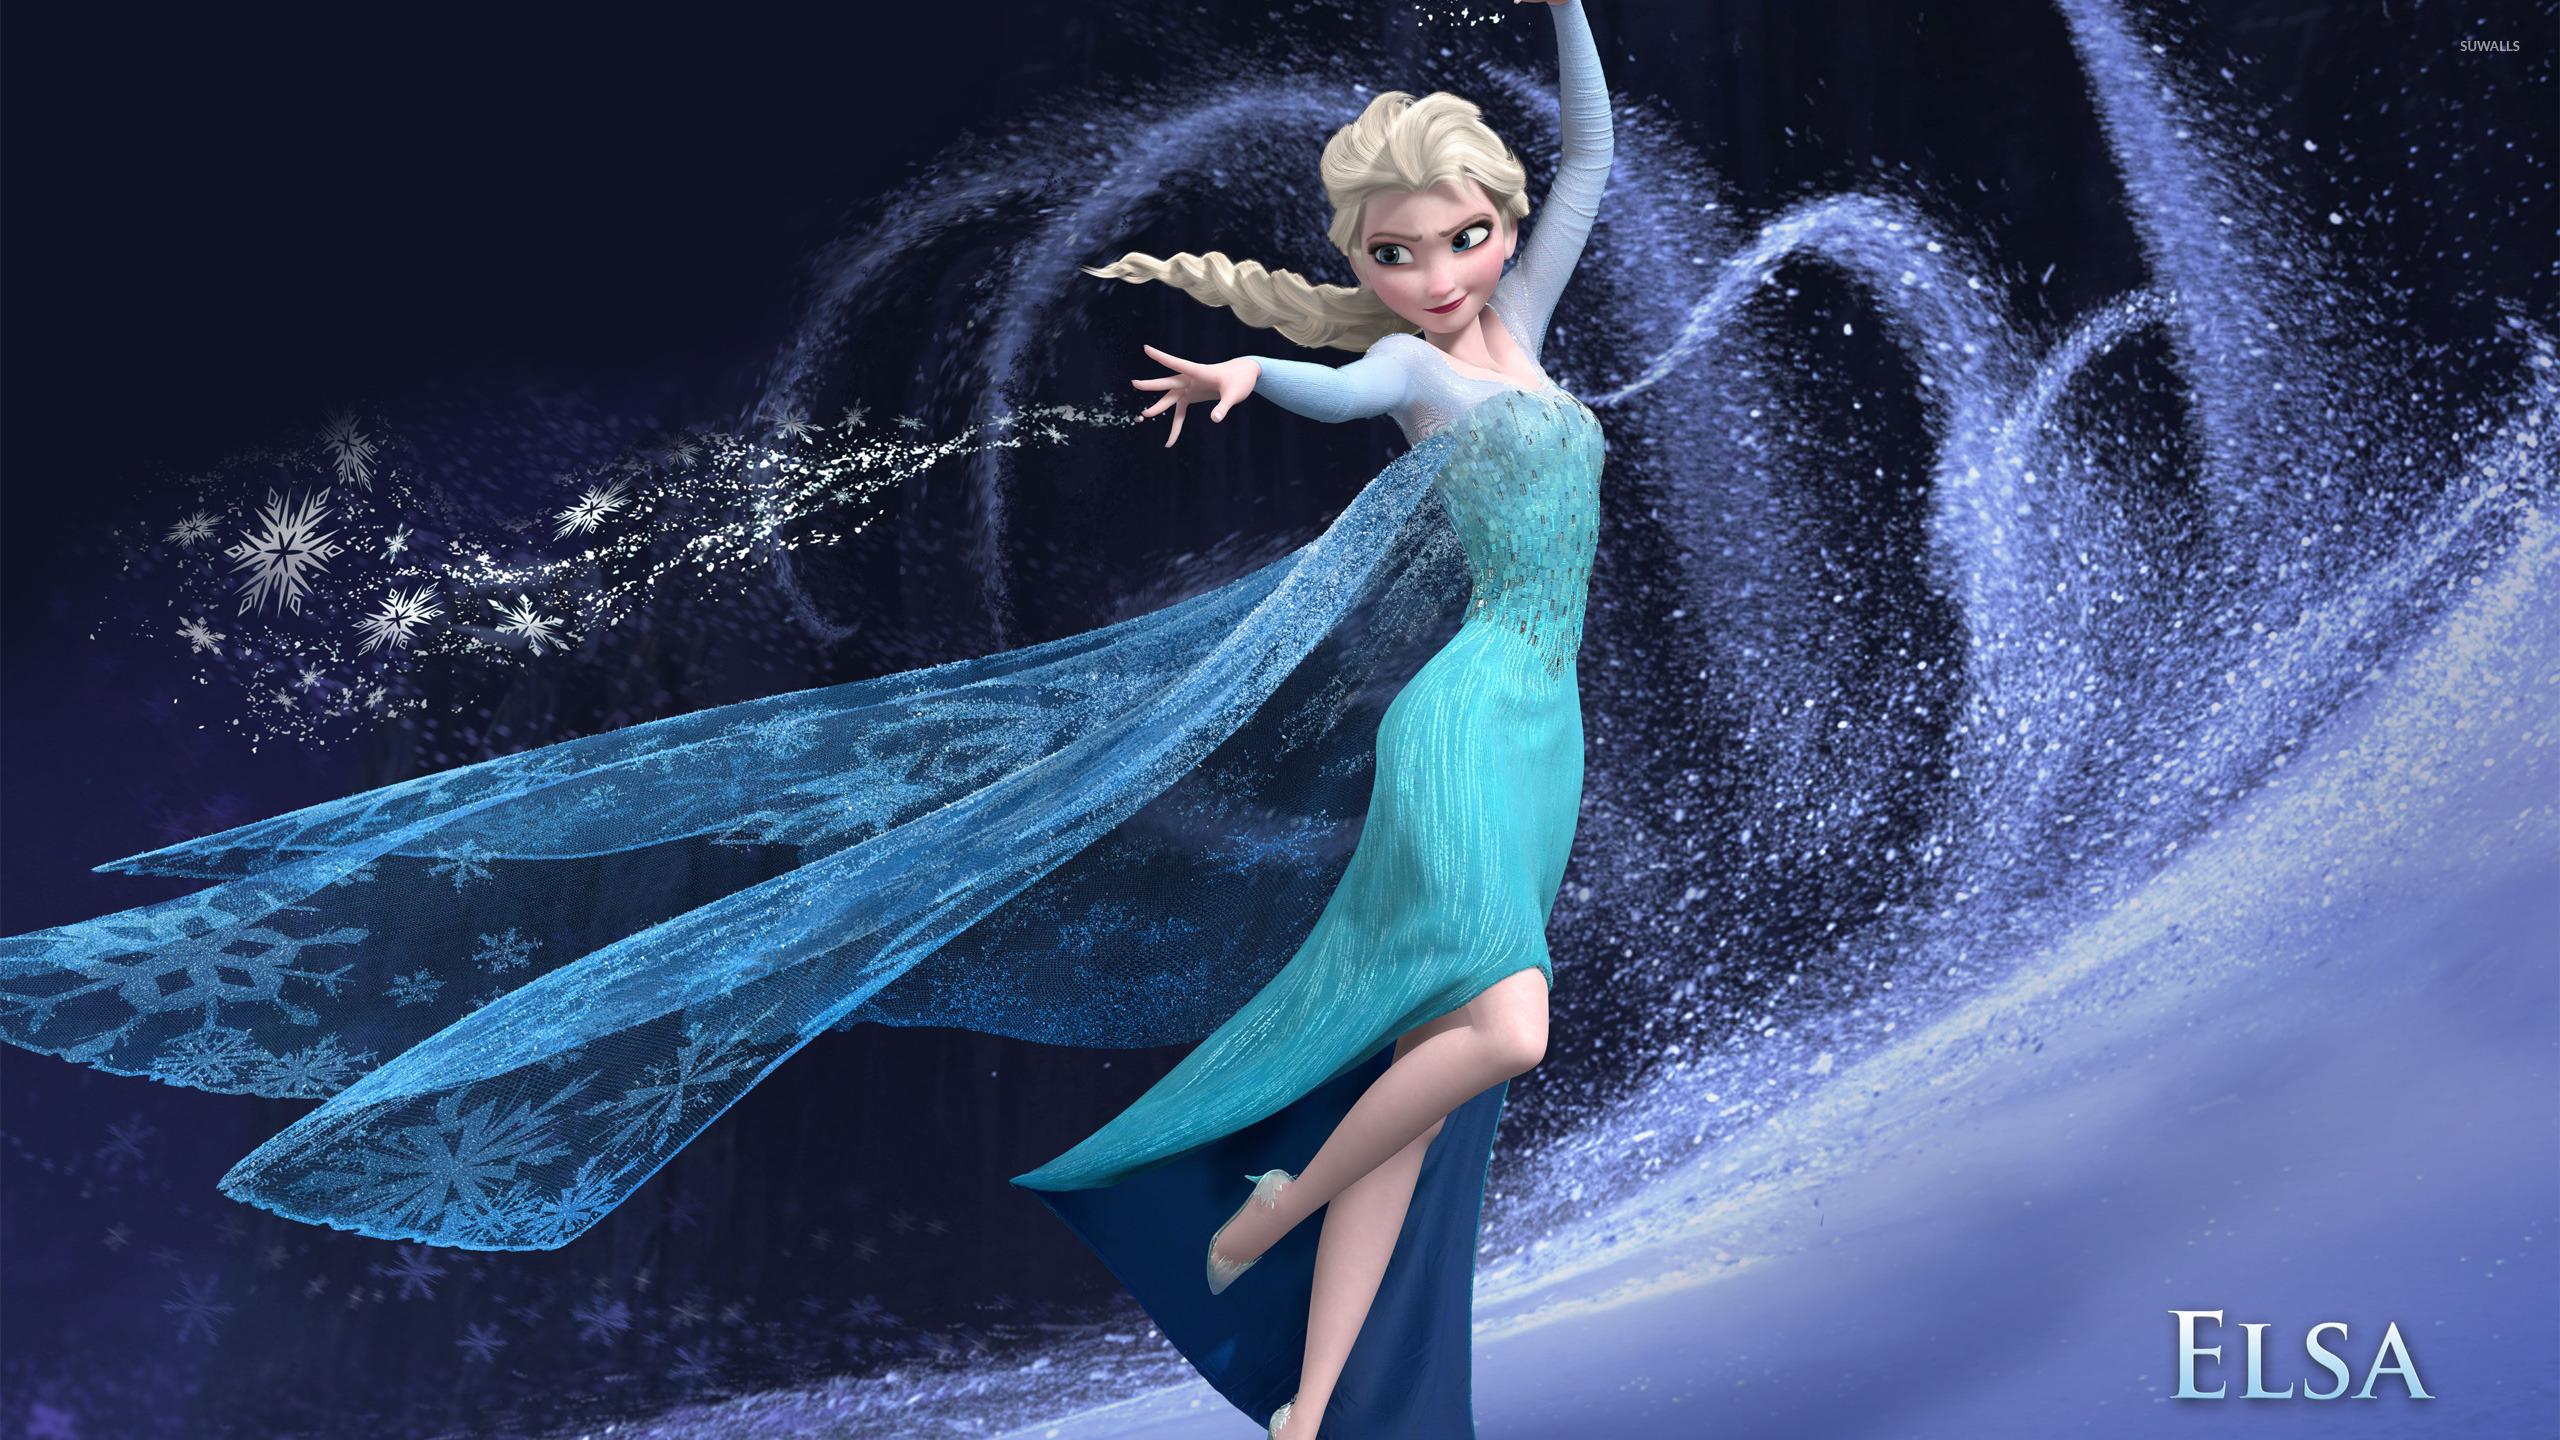 Frozen Let It Go , HD Wallpaper & Backgrounds